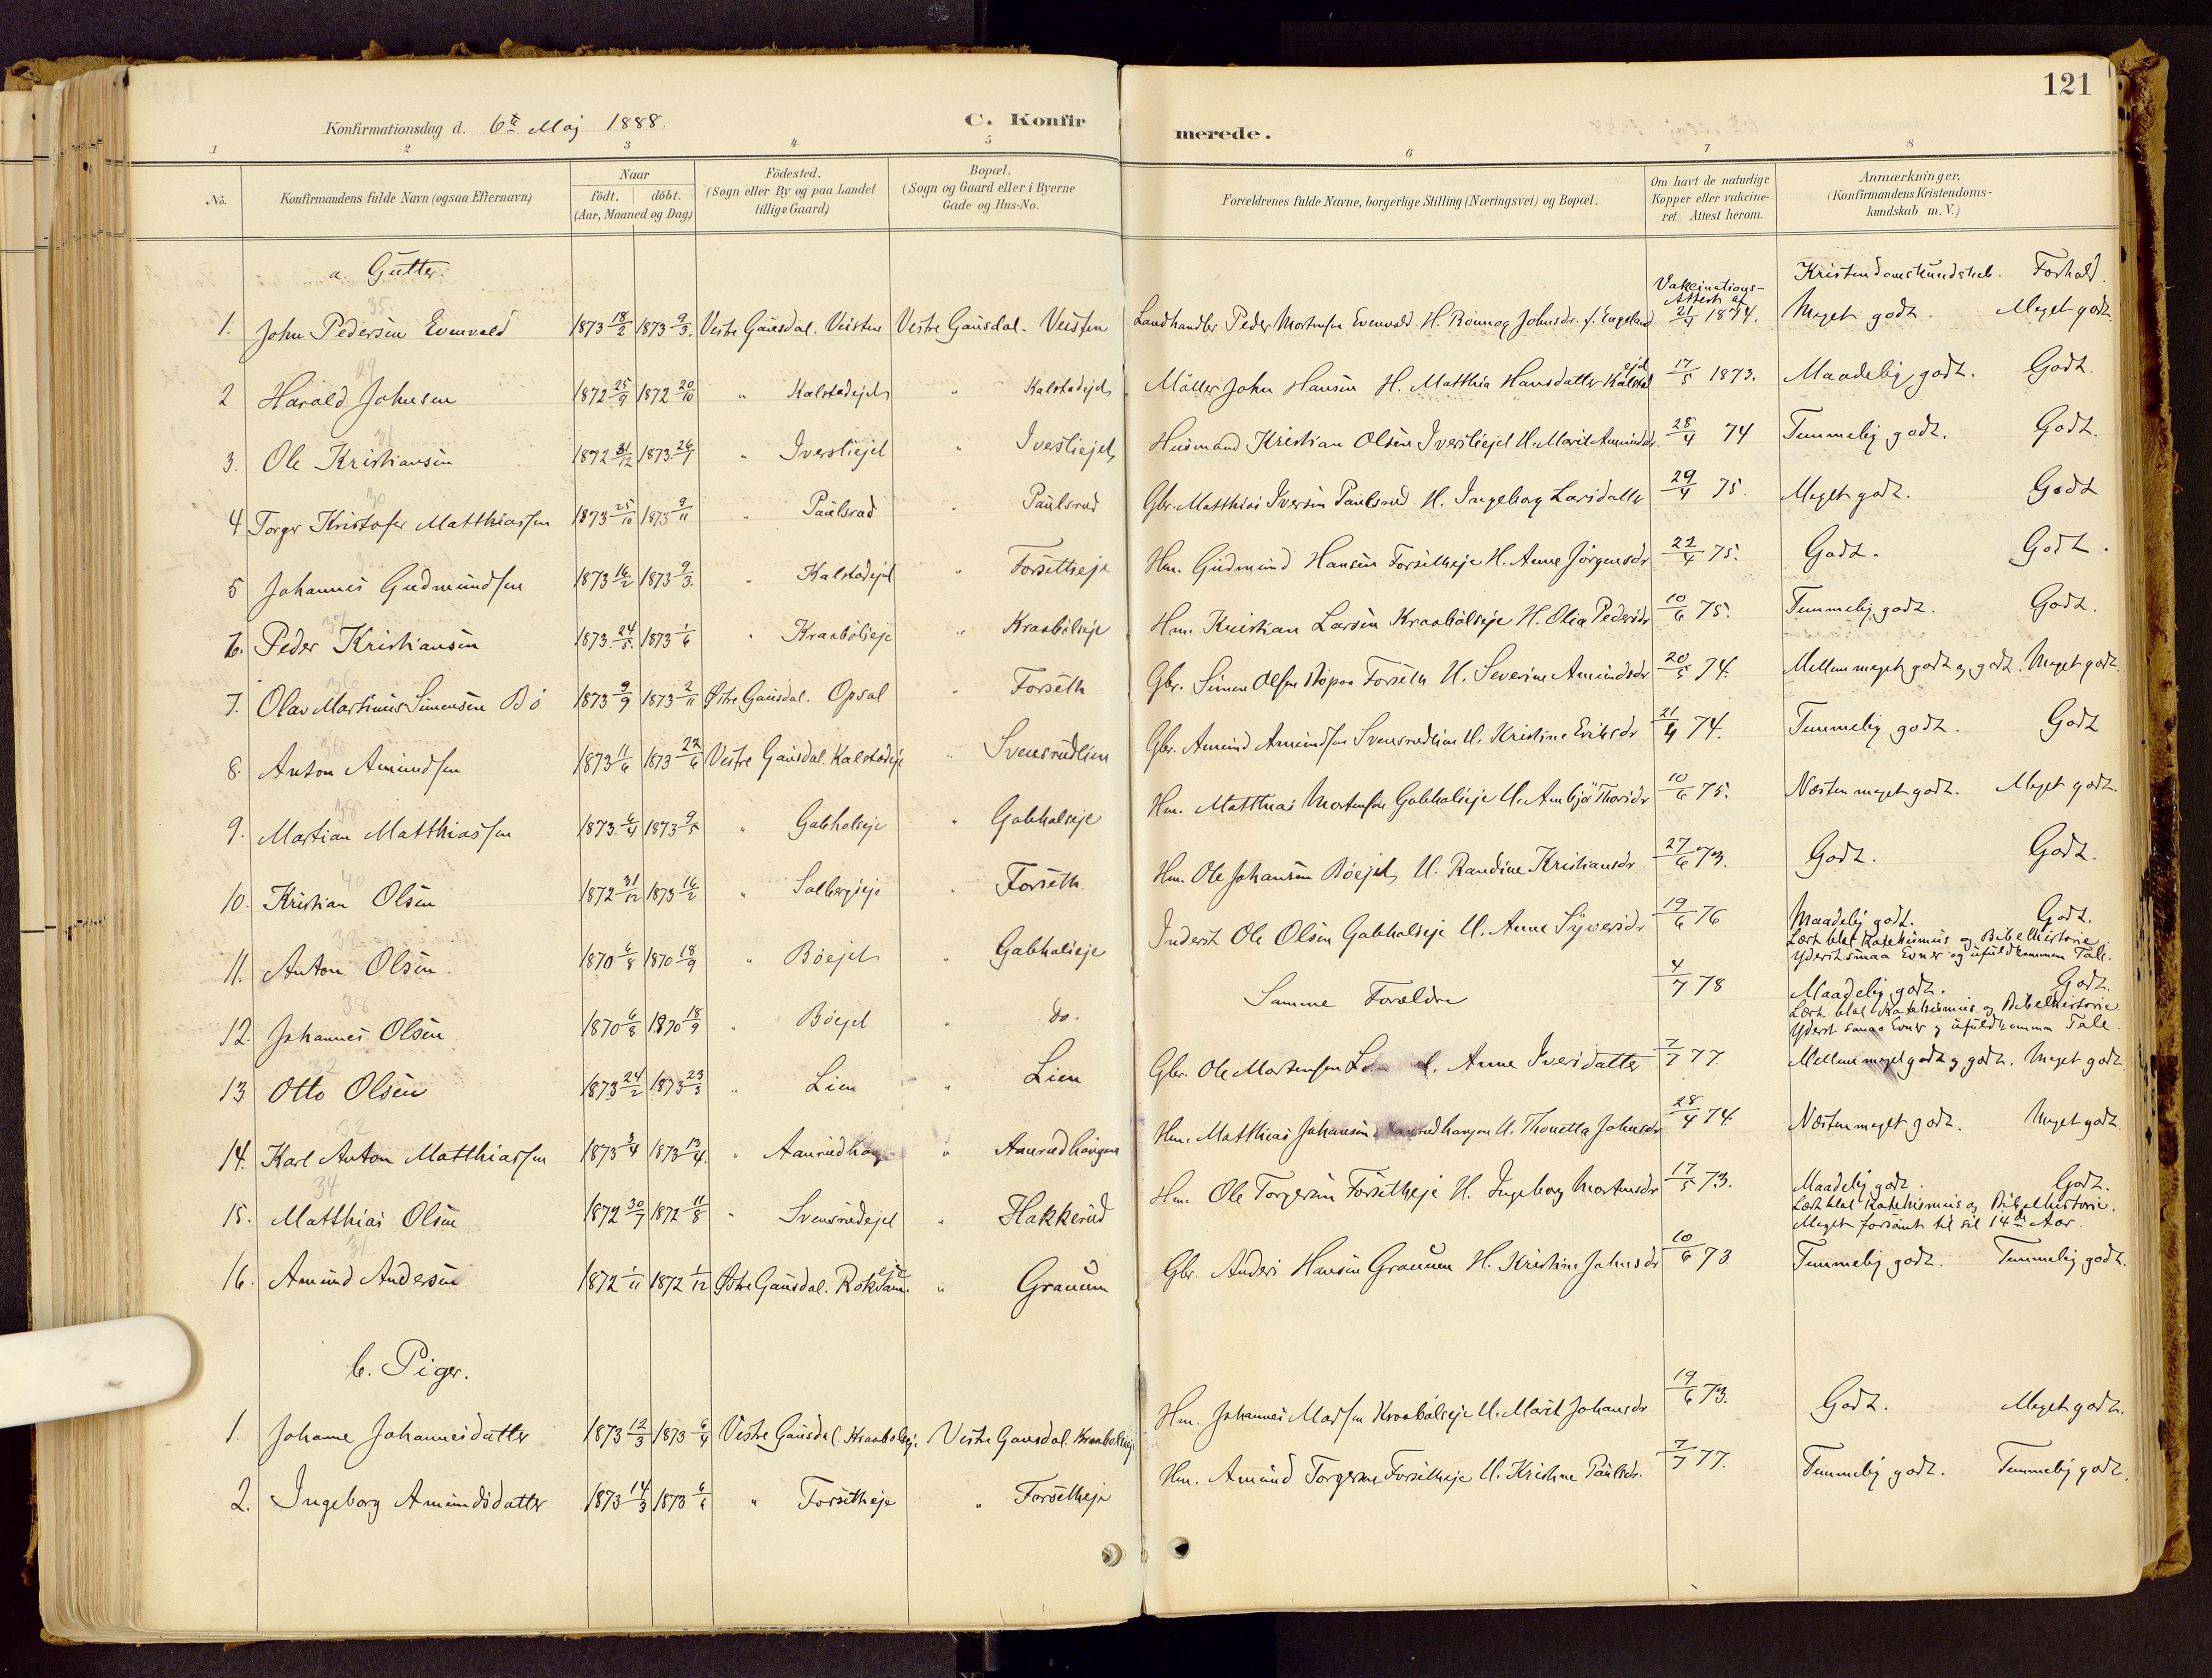 SAH, Vestre Gausdal prestekontor, Ministerialbok nr. 1, 1887-1914, s. 121